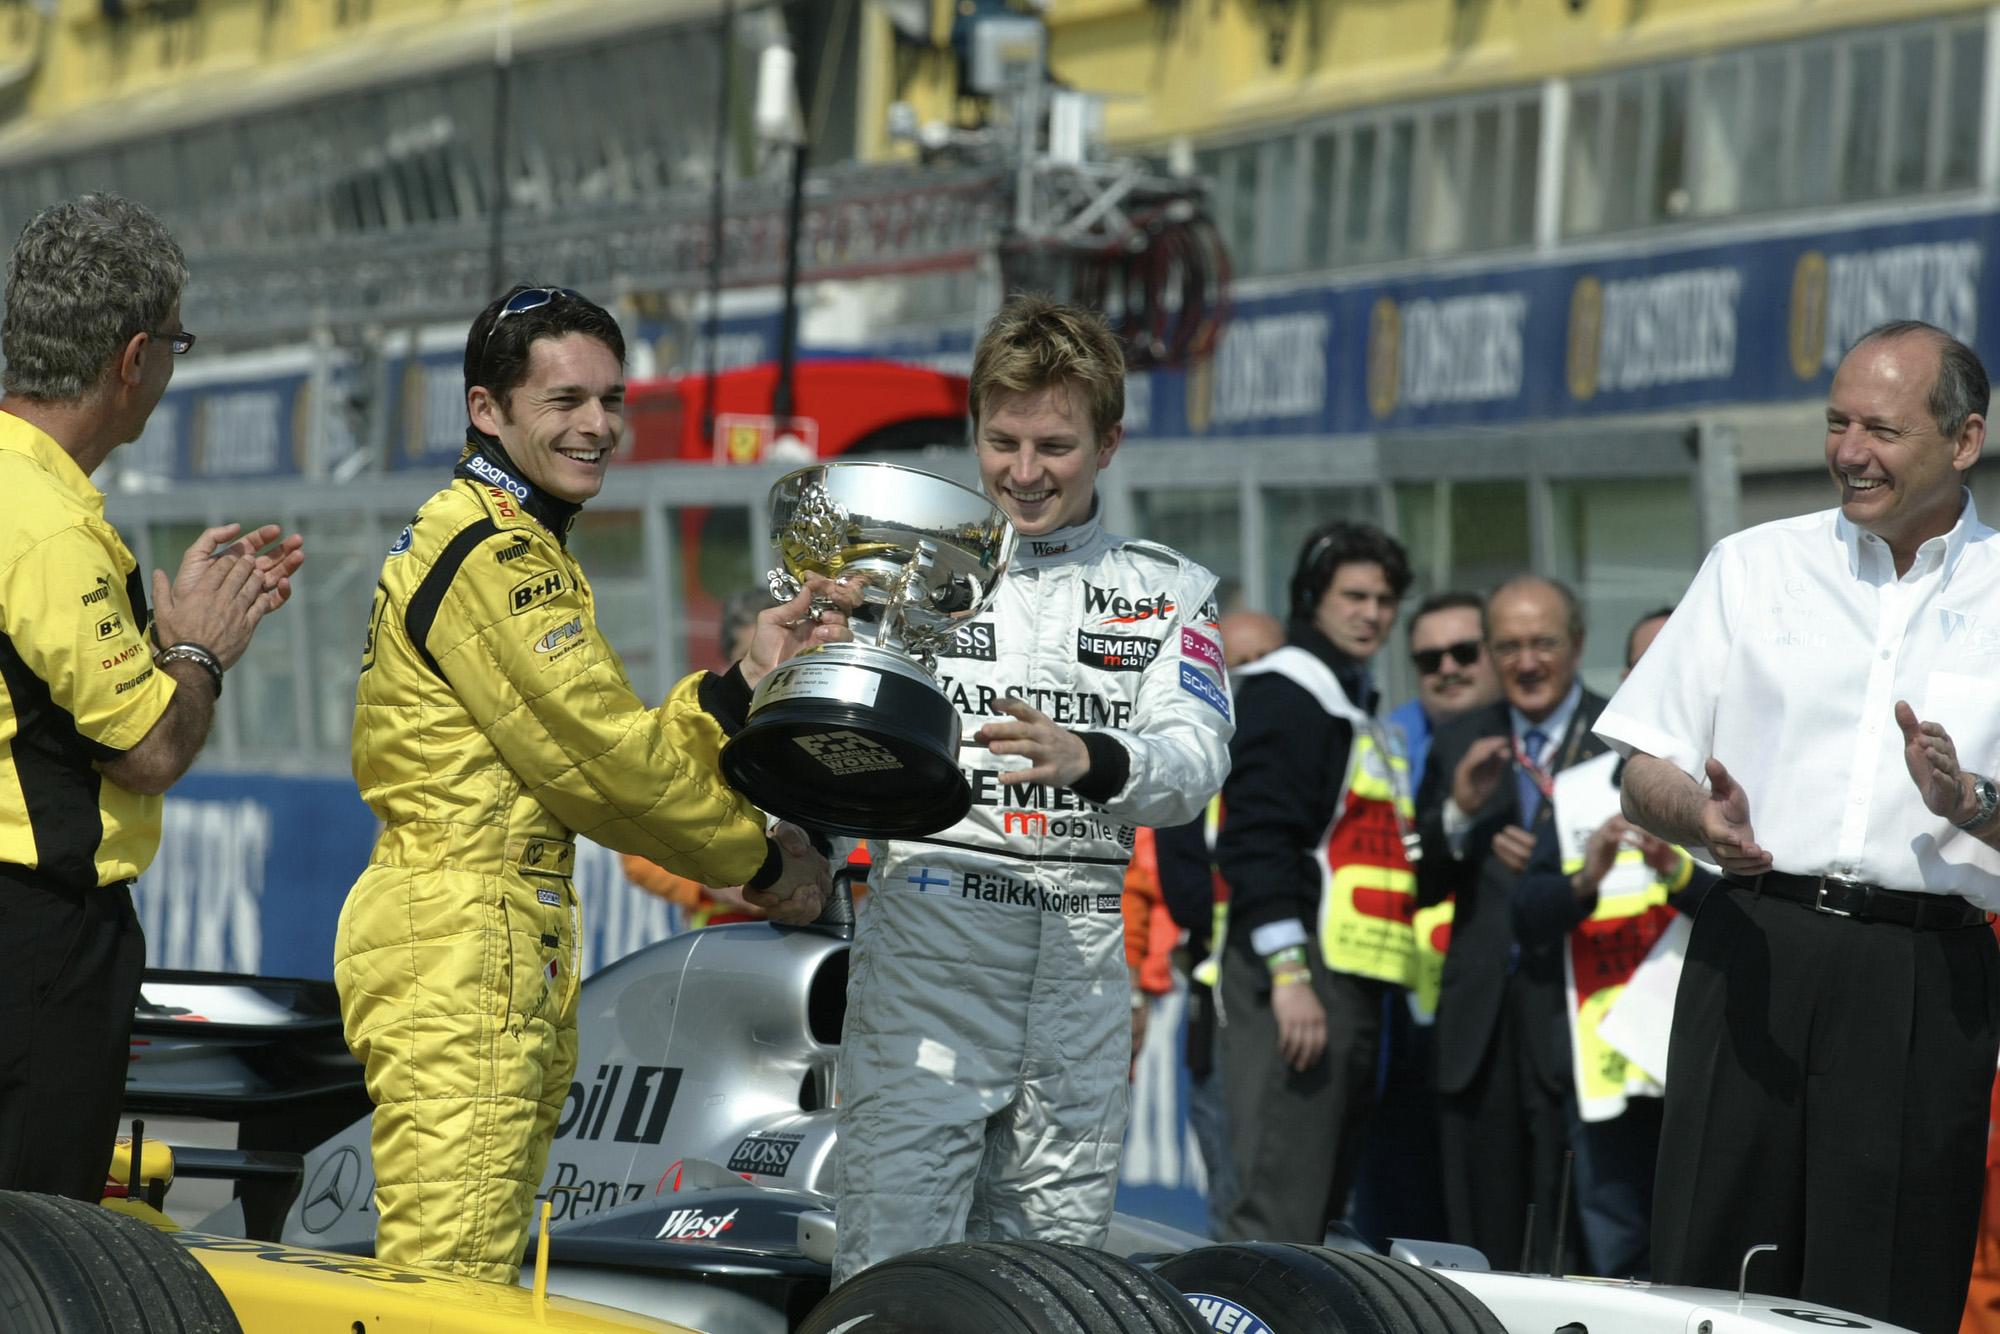 Kimi Raikkonen hands the winning trophy for the 2003 F1 Brazilian Grand Prix to Giancarlo Fisichella